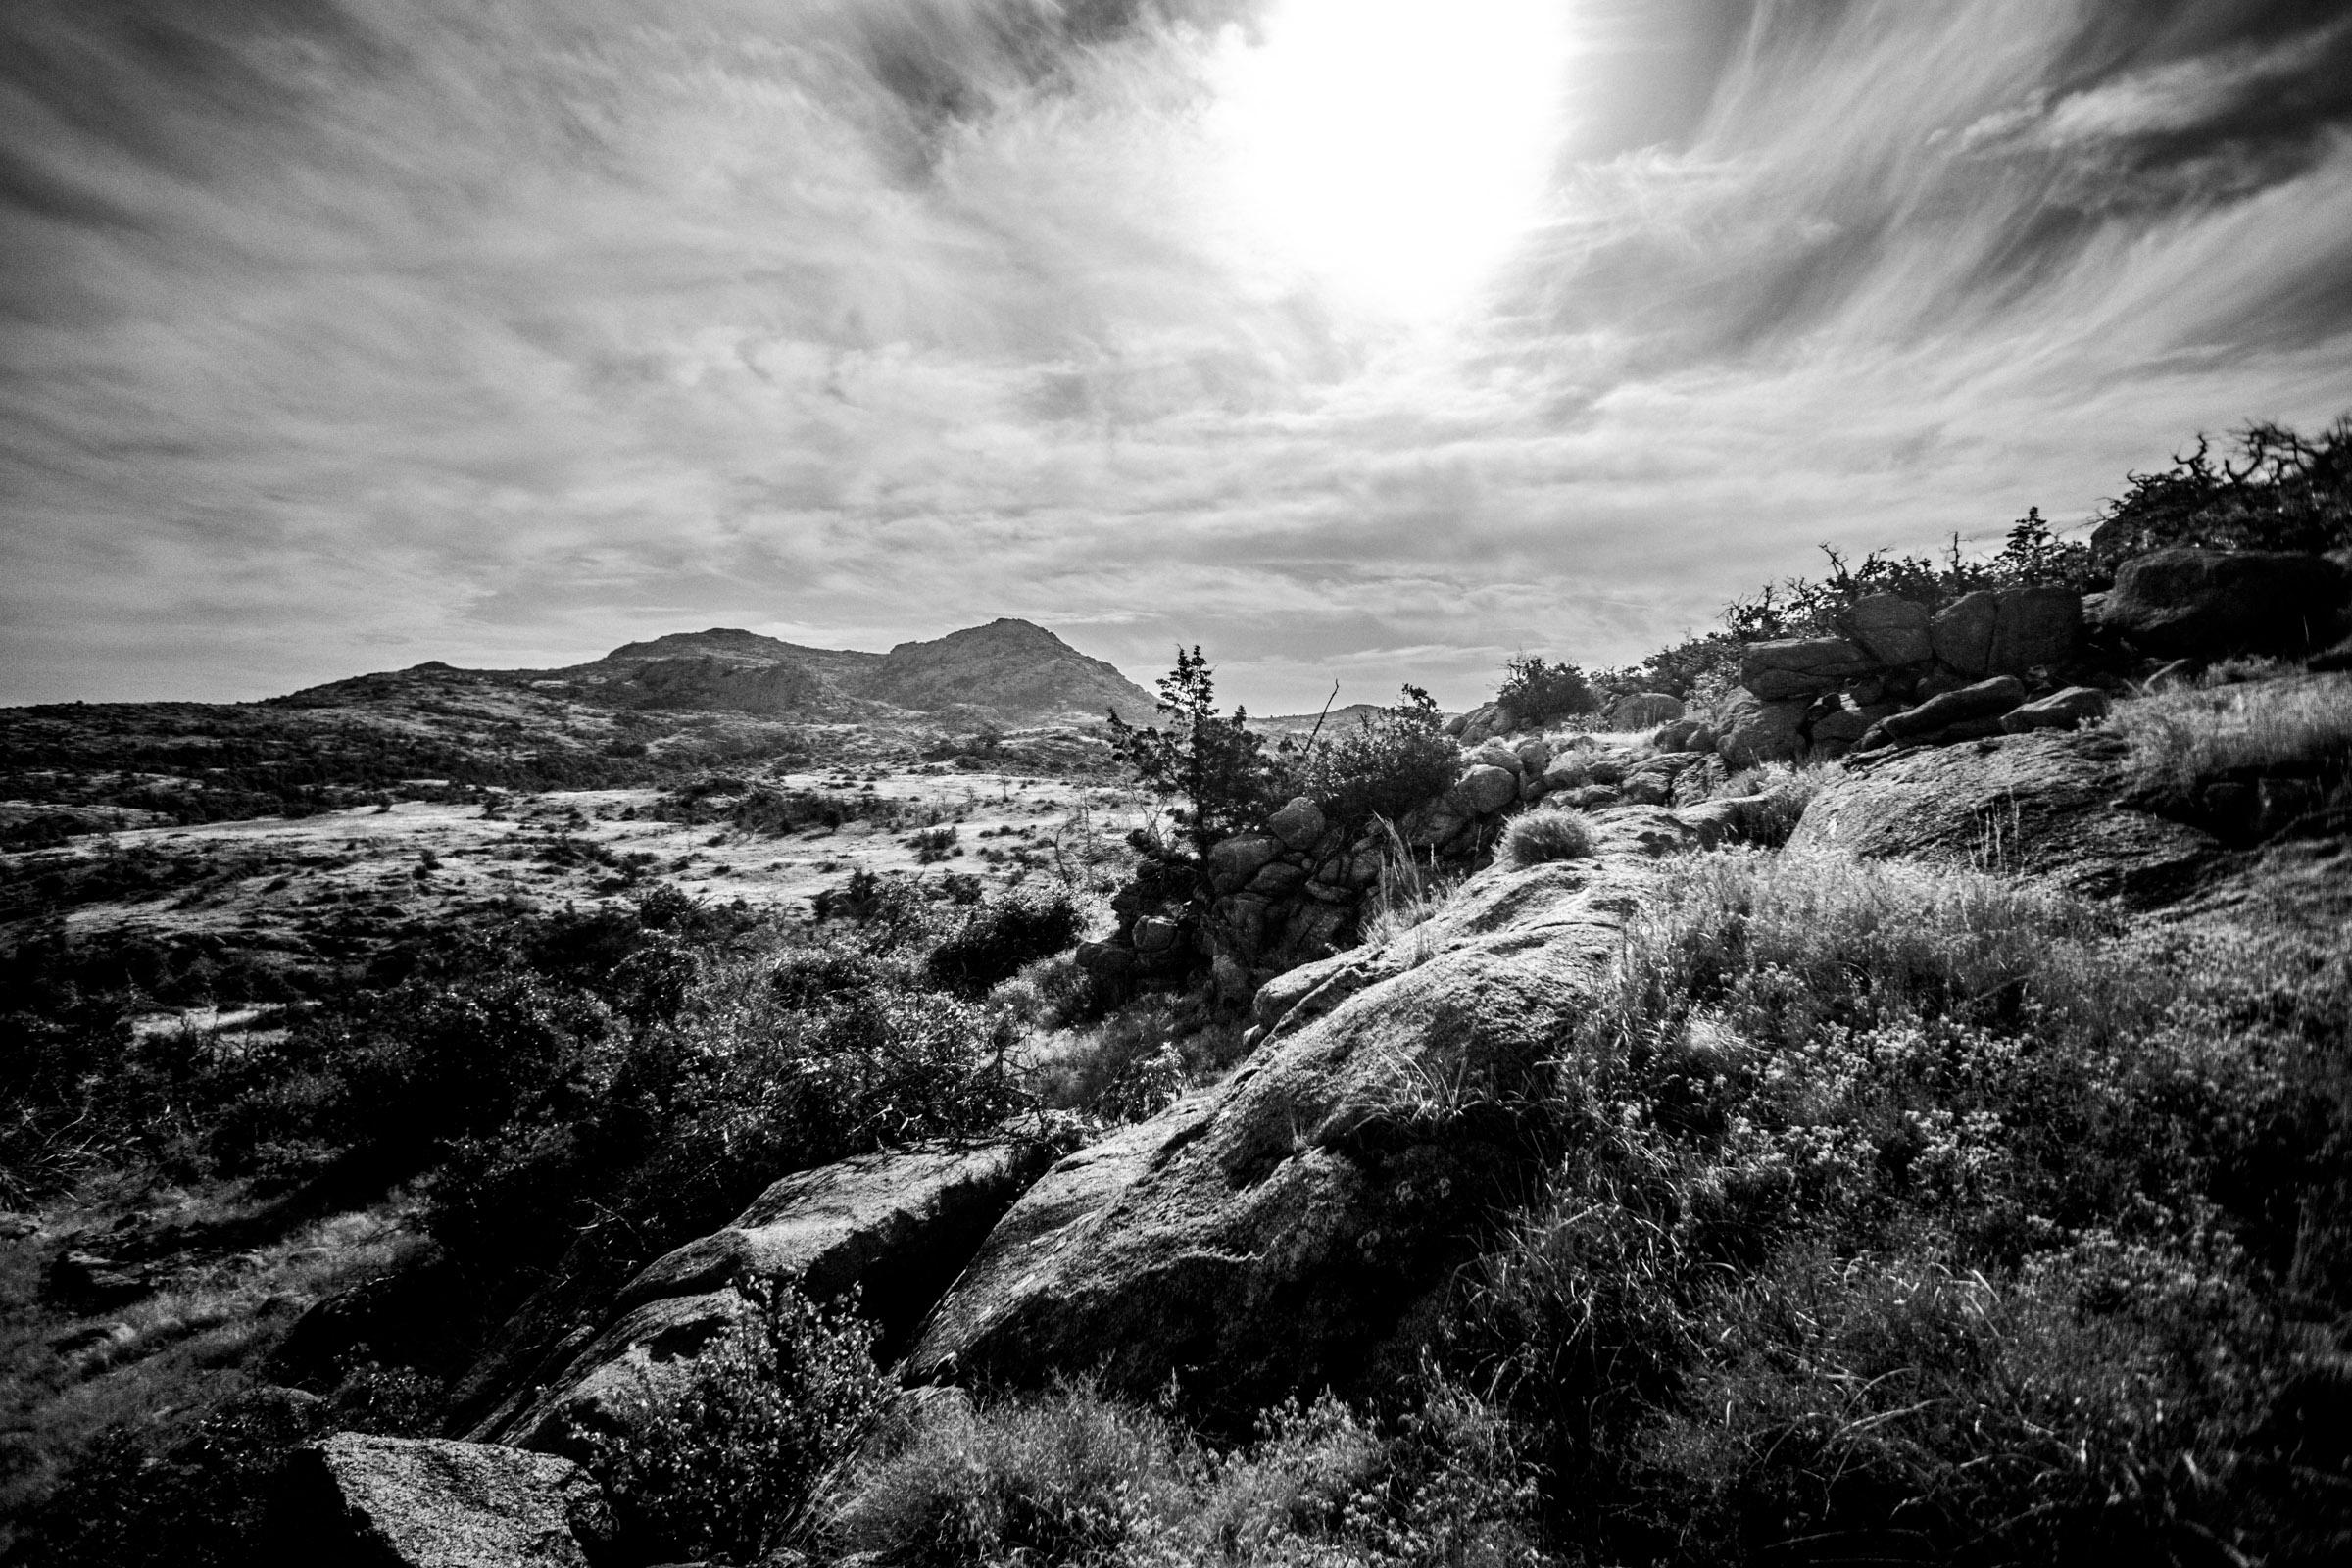 Mount Mitchell B&W 08-07-16 (15 of 35).jpg